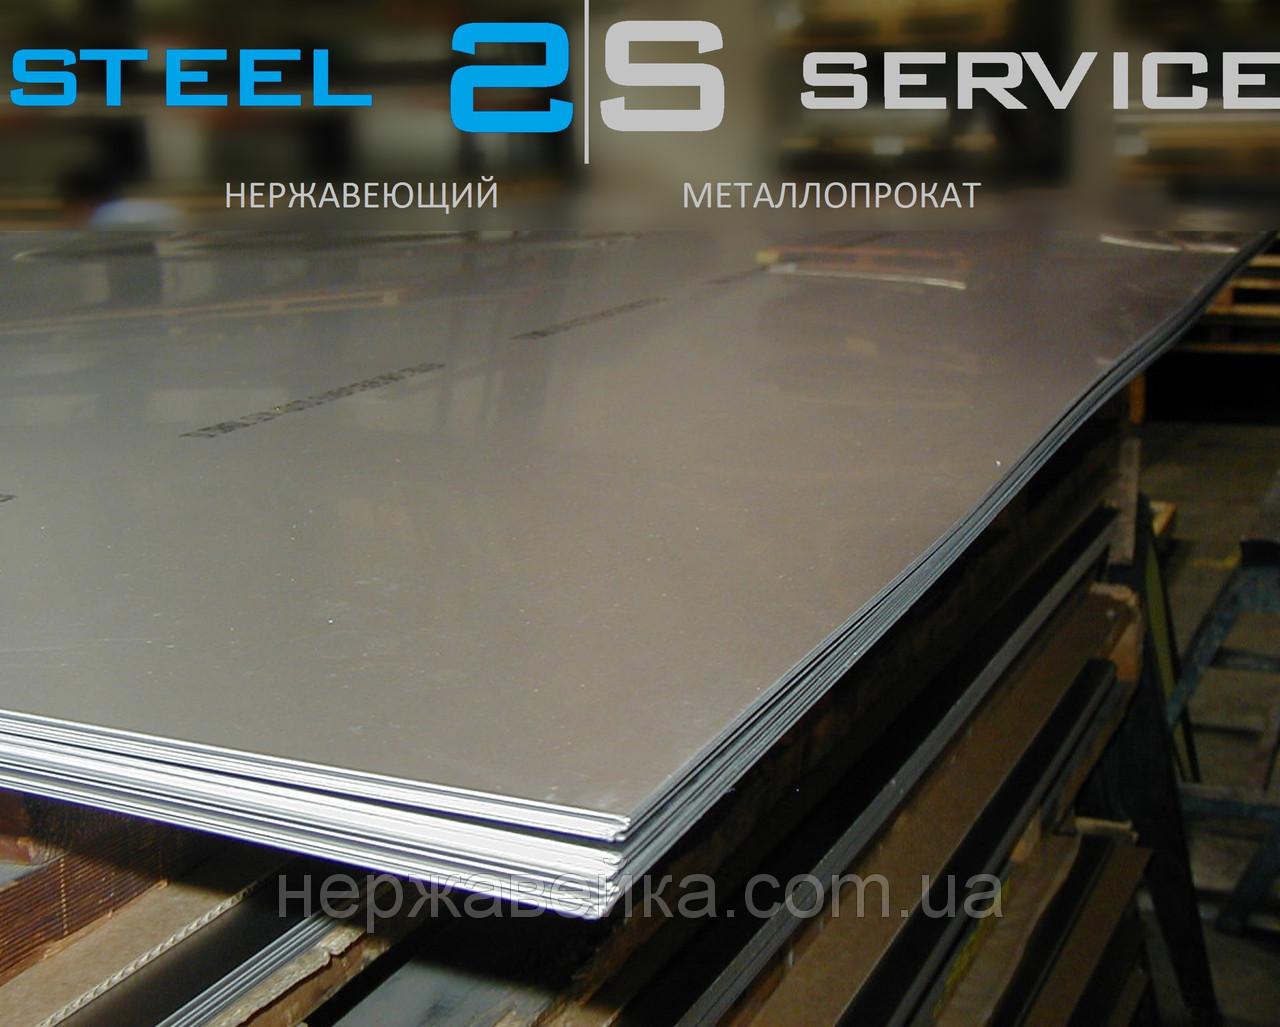 Листовая нержавейка 1,5х1000х2000мм AISI 430(12Х17) 2B - матовый, технический